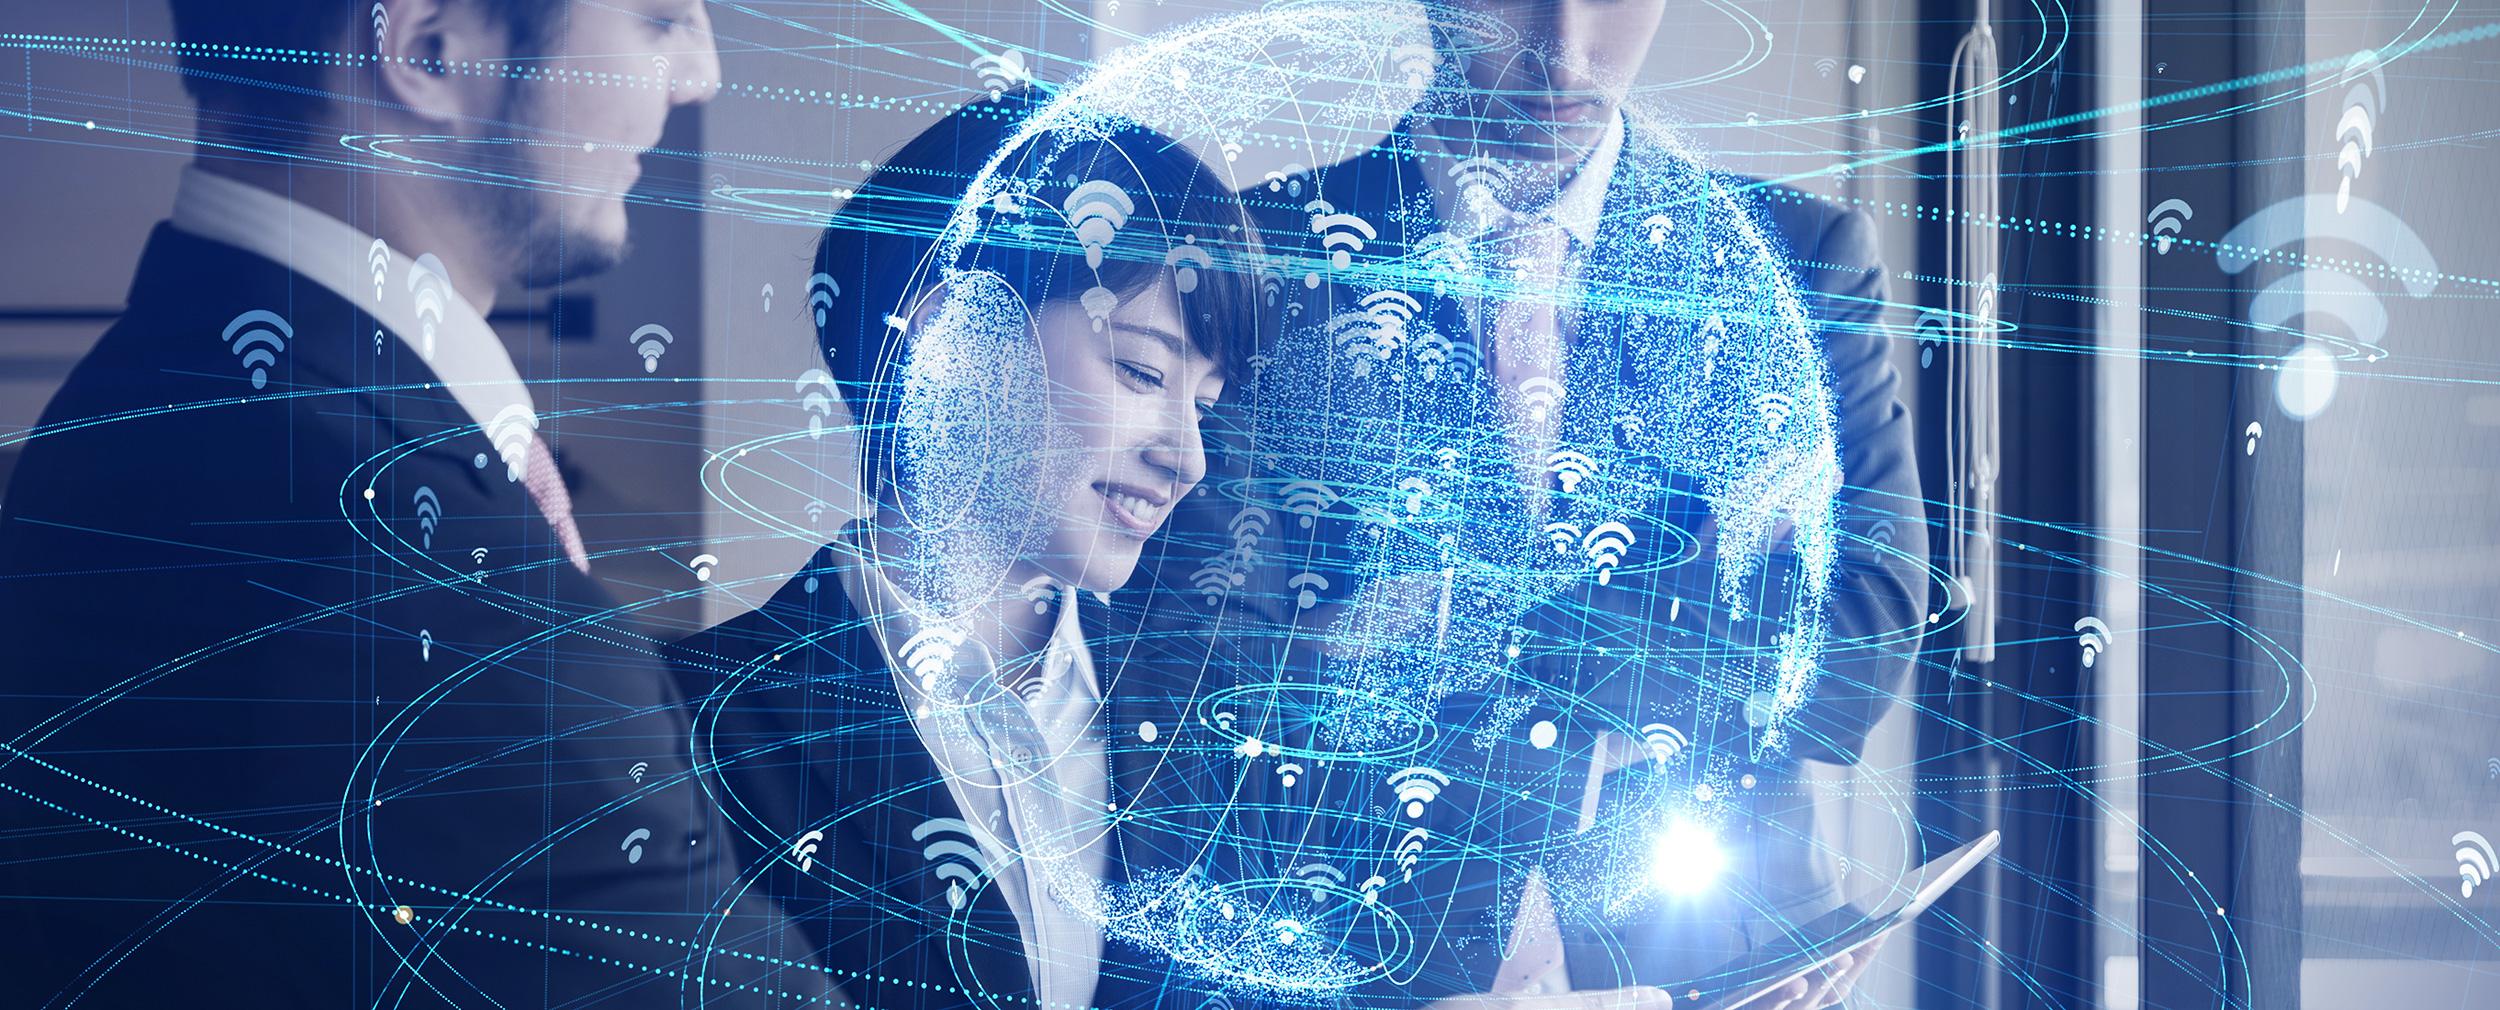 hero-data-connected-global